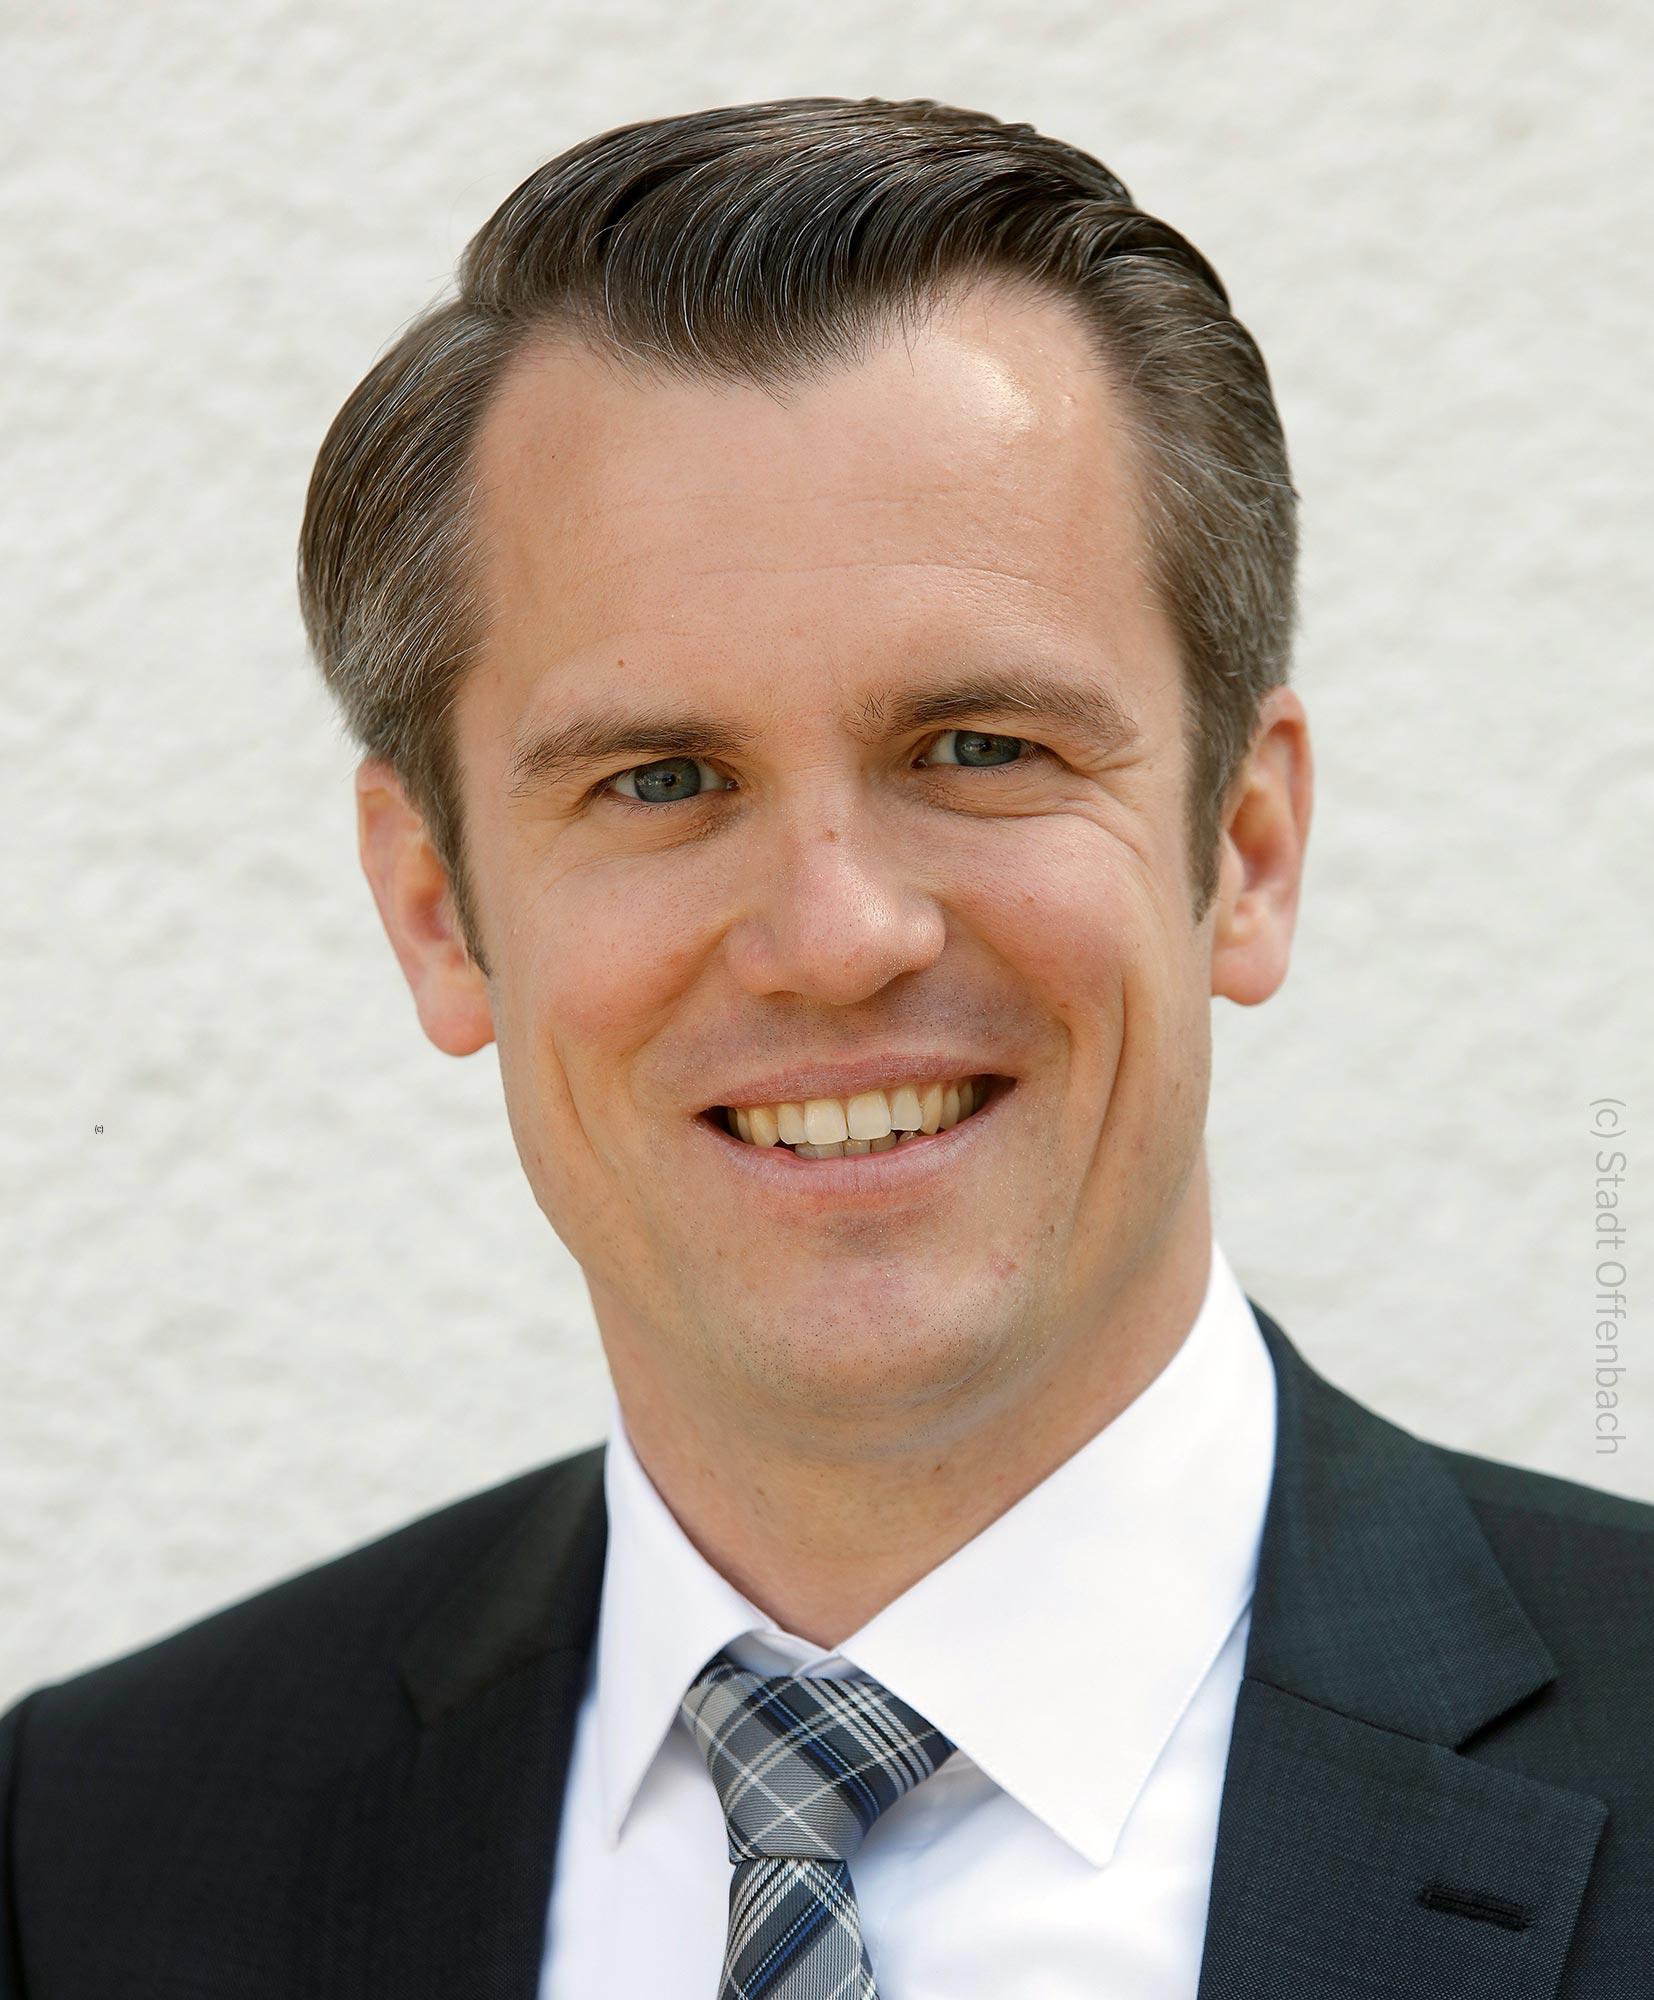 Felix Schwenke (SPD) - Bürgermeister der Stadt Offenbach - Oberbürgermeister Offenbach am Main